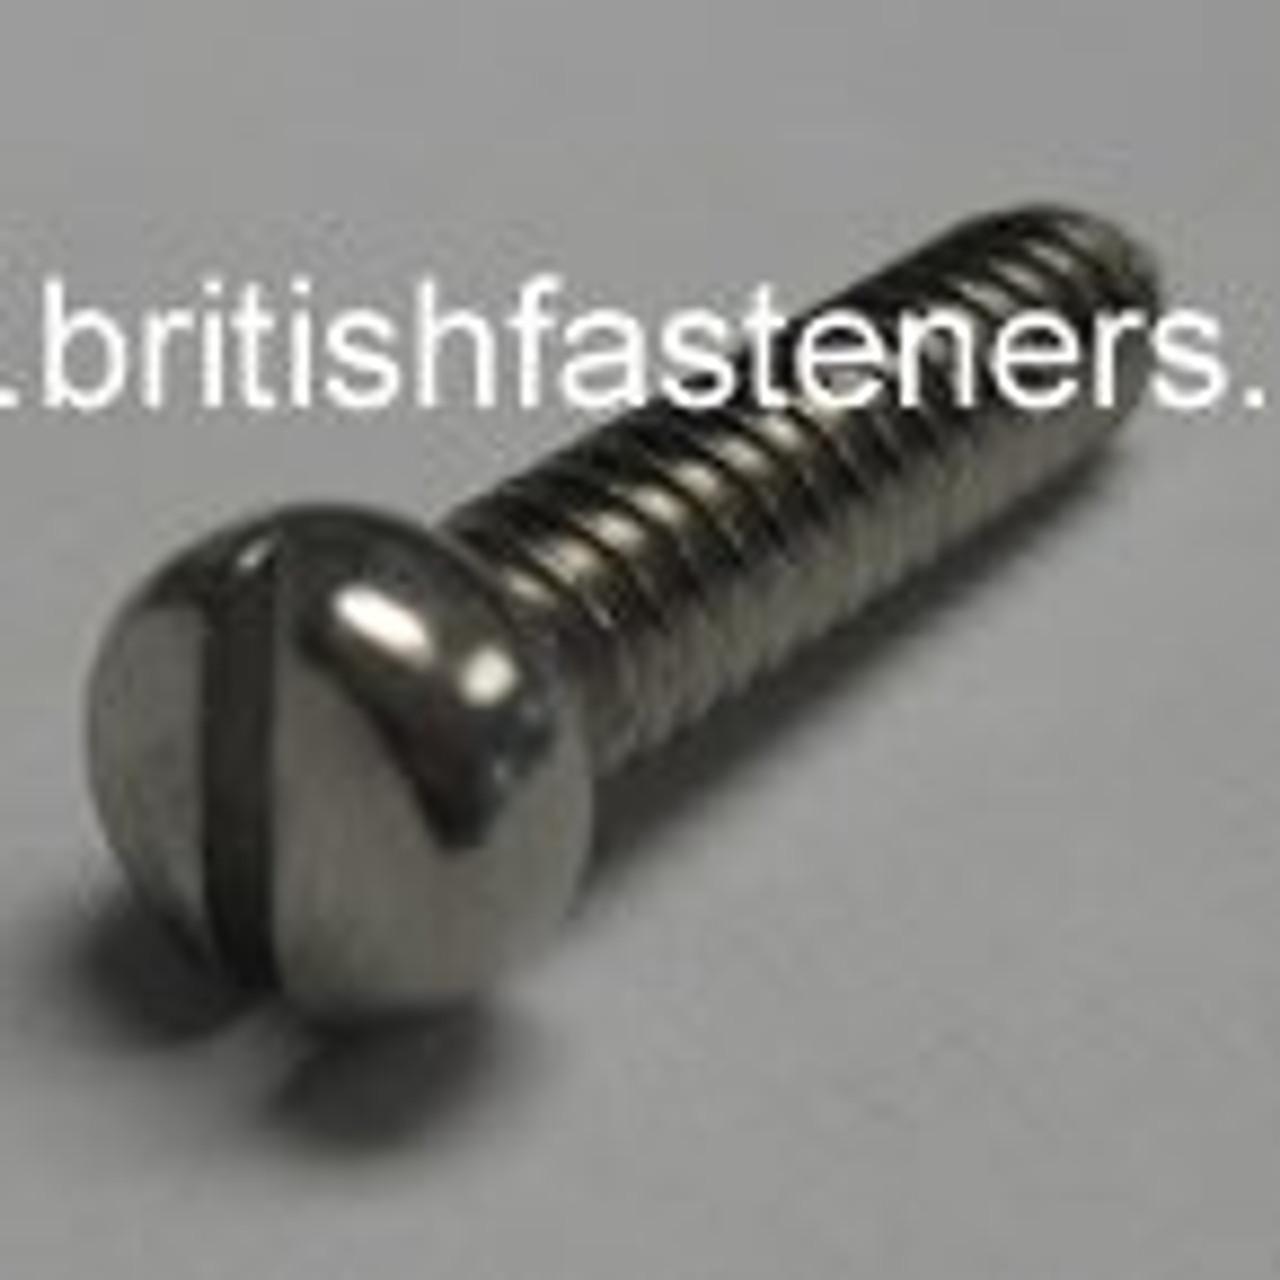 "1 BA x 11/16"" Stainless Phillister Screw - (7702)"